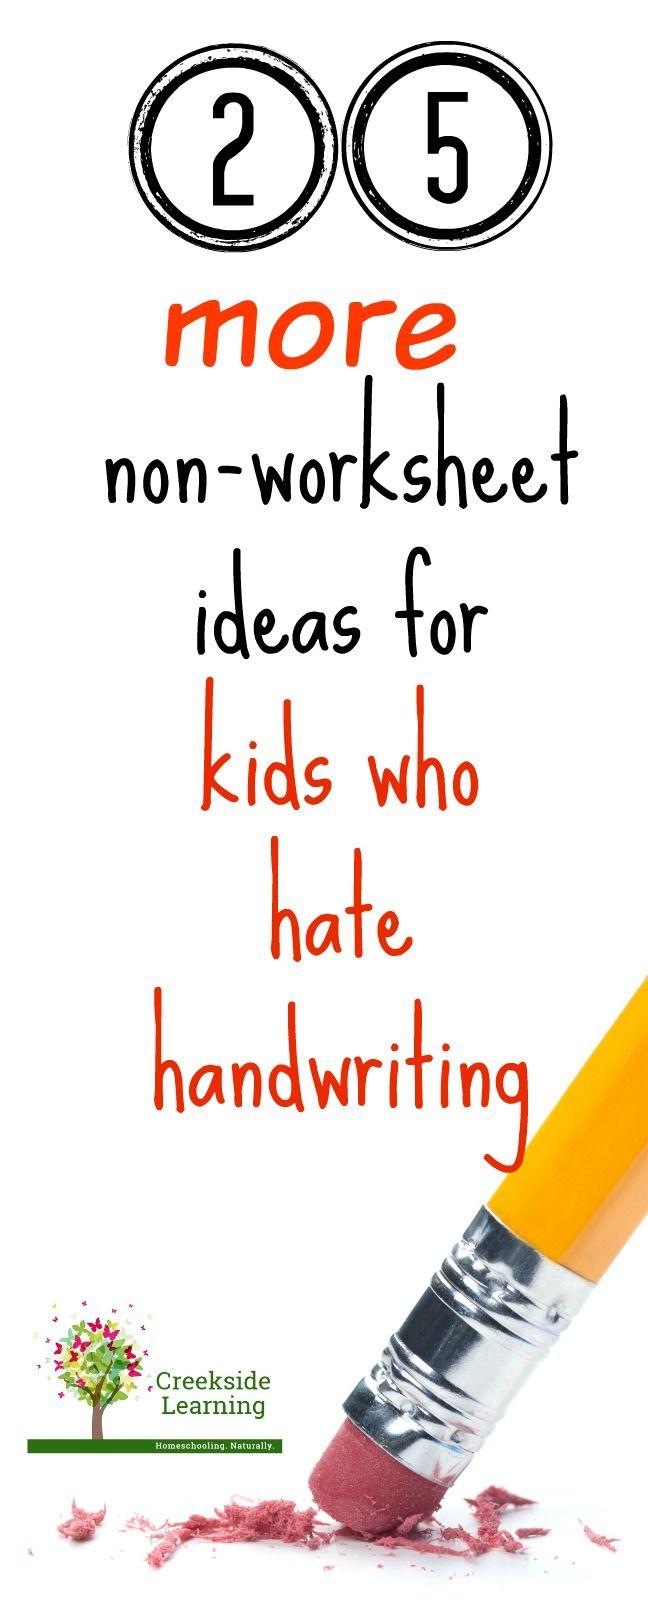 25 MORE Fun Handwriting Practice Ideas - No Worksheets | Pinterest ...